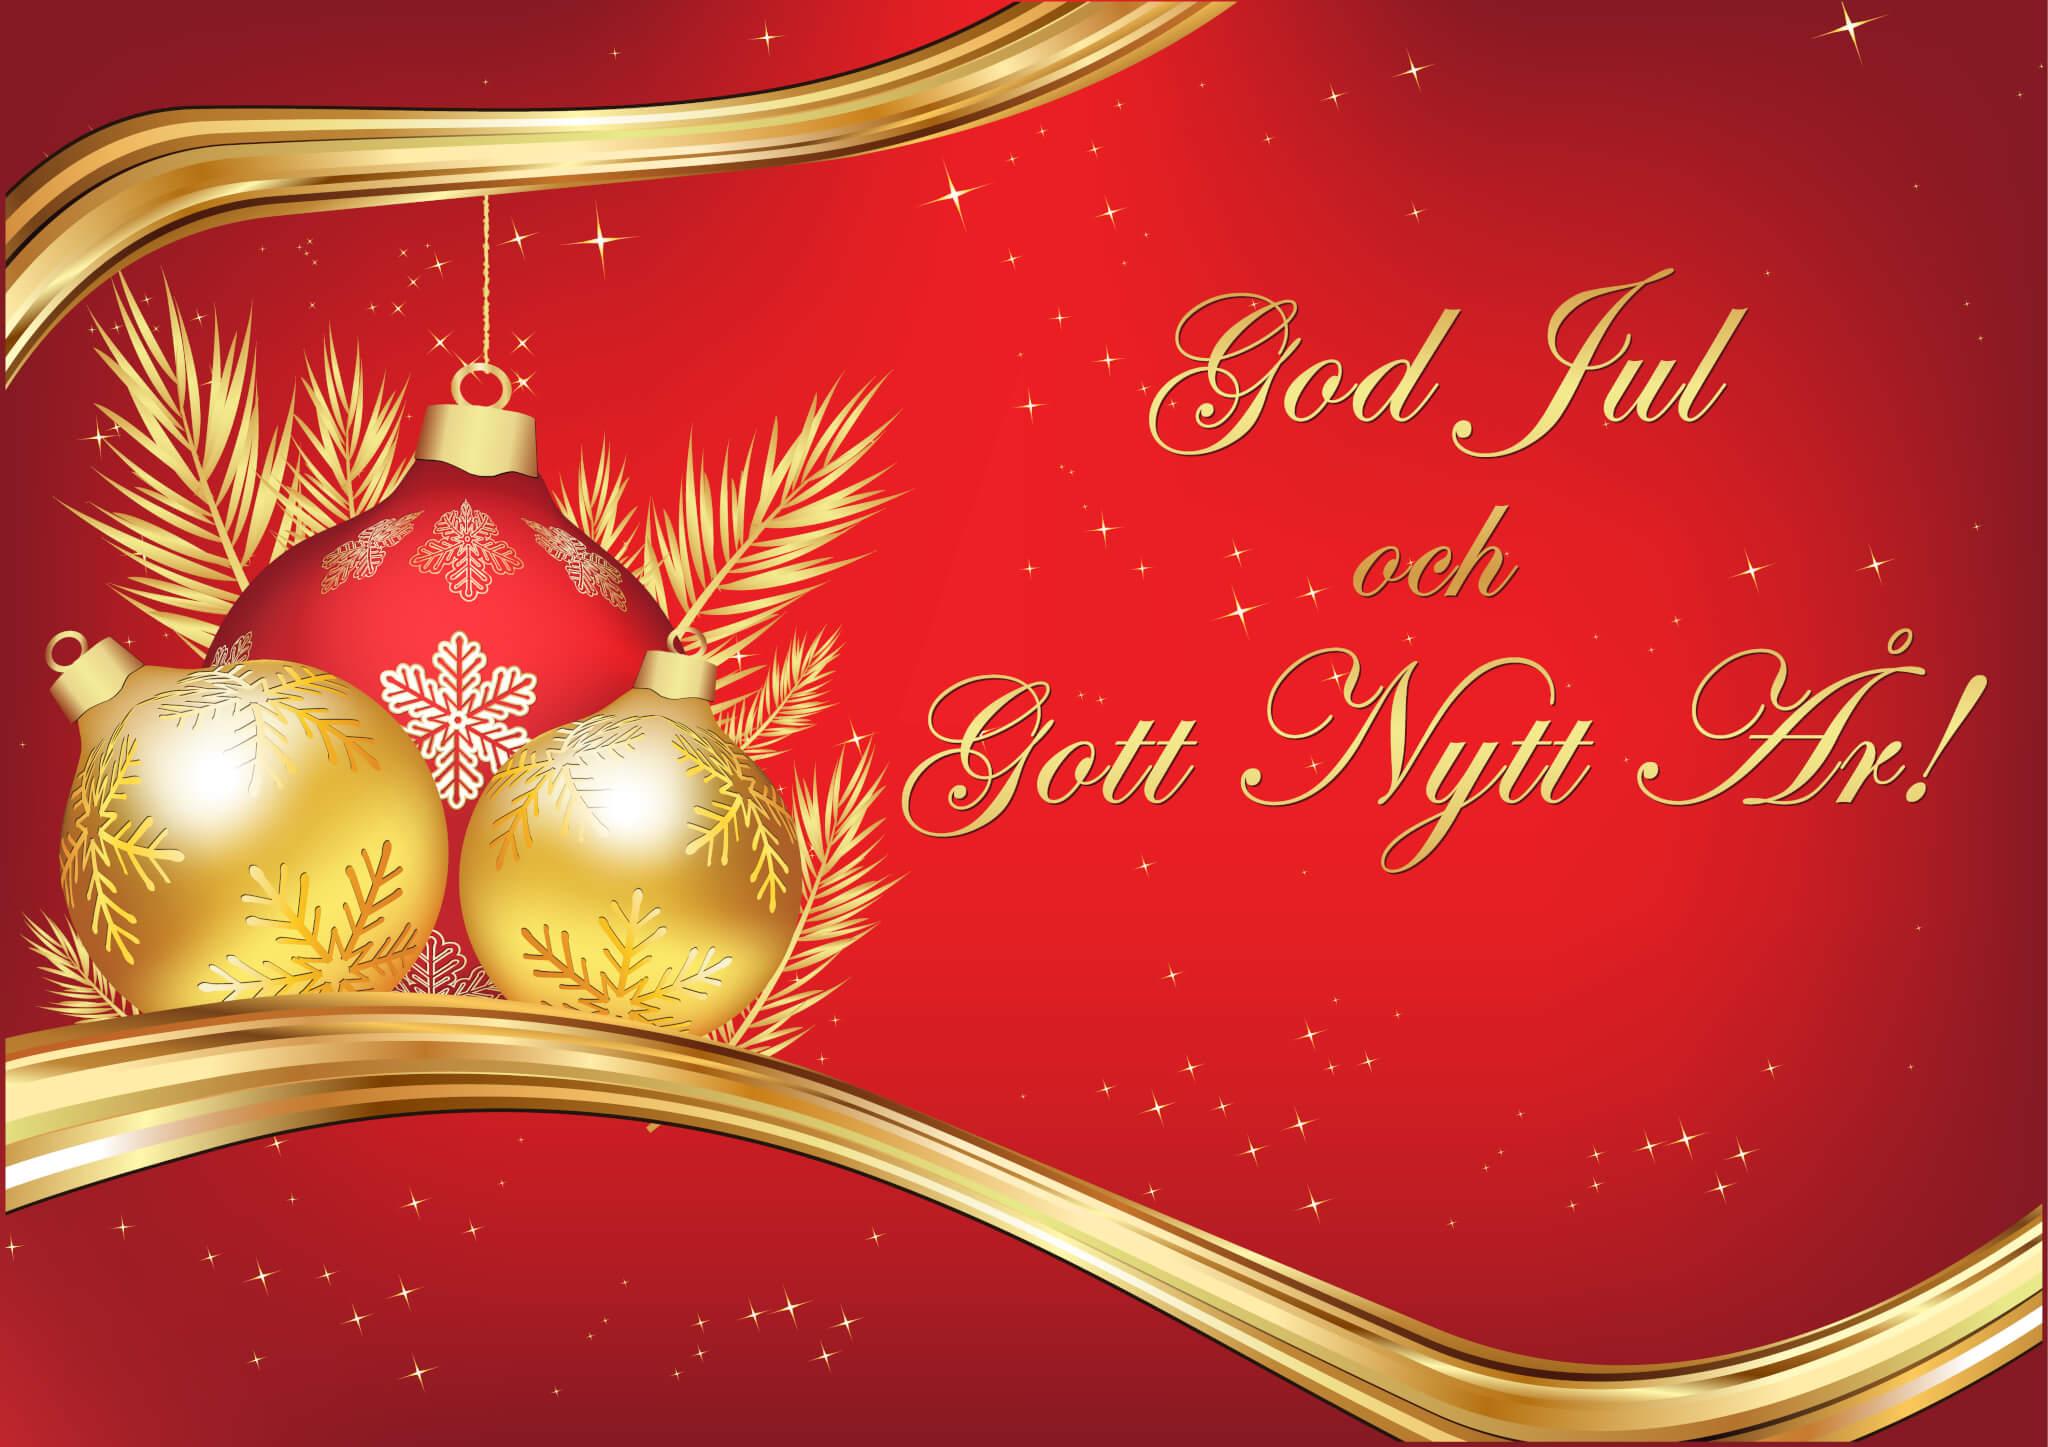 God Jul önskar mPowerment